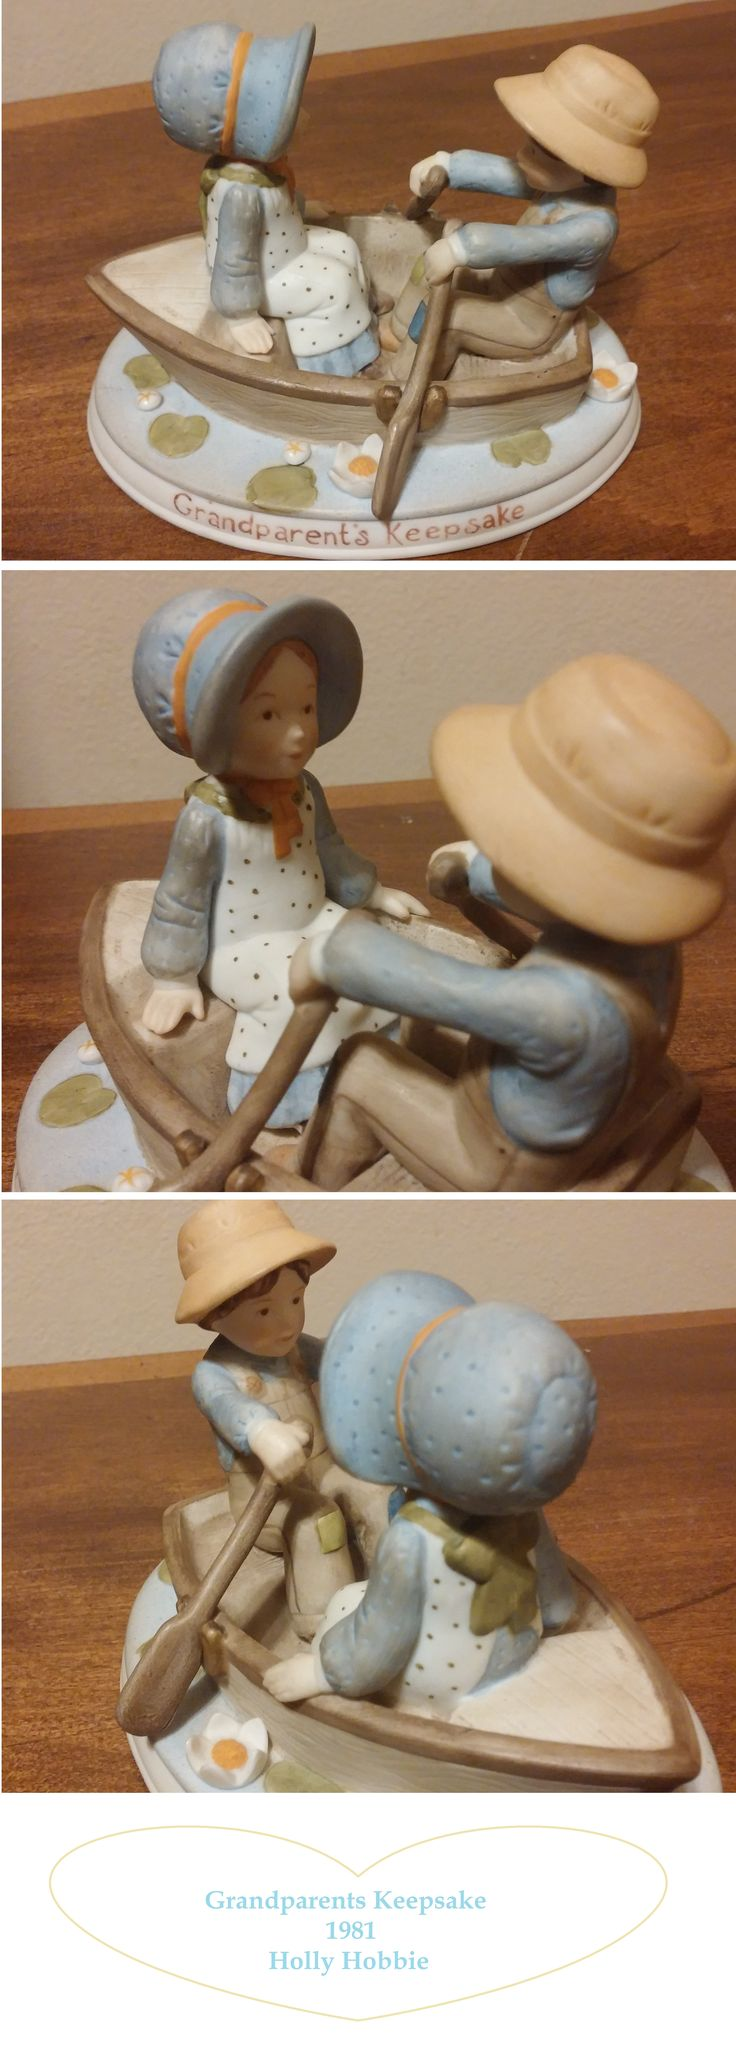 411 best holly hobbie love images on pinterest holly holly hobbie grandparents keepsake 1981 reviewsmspy